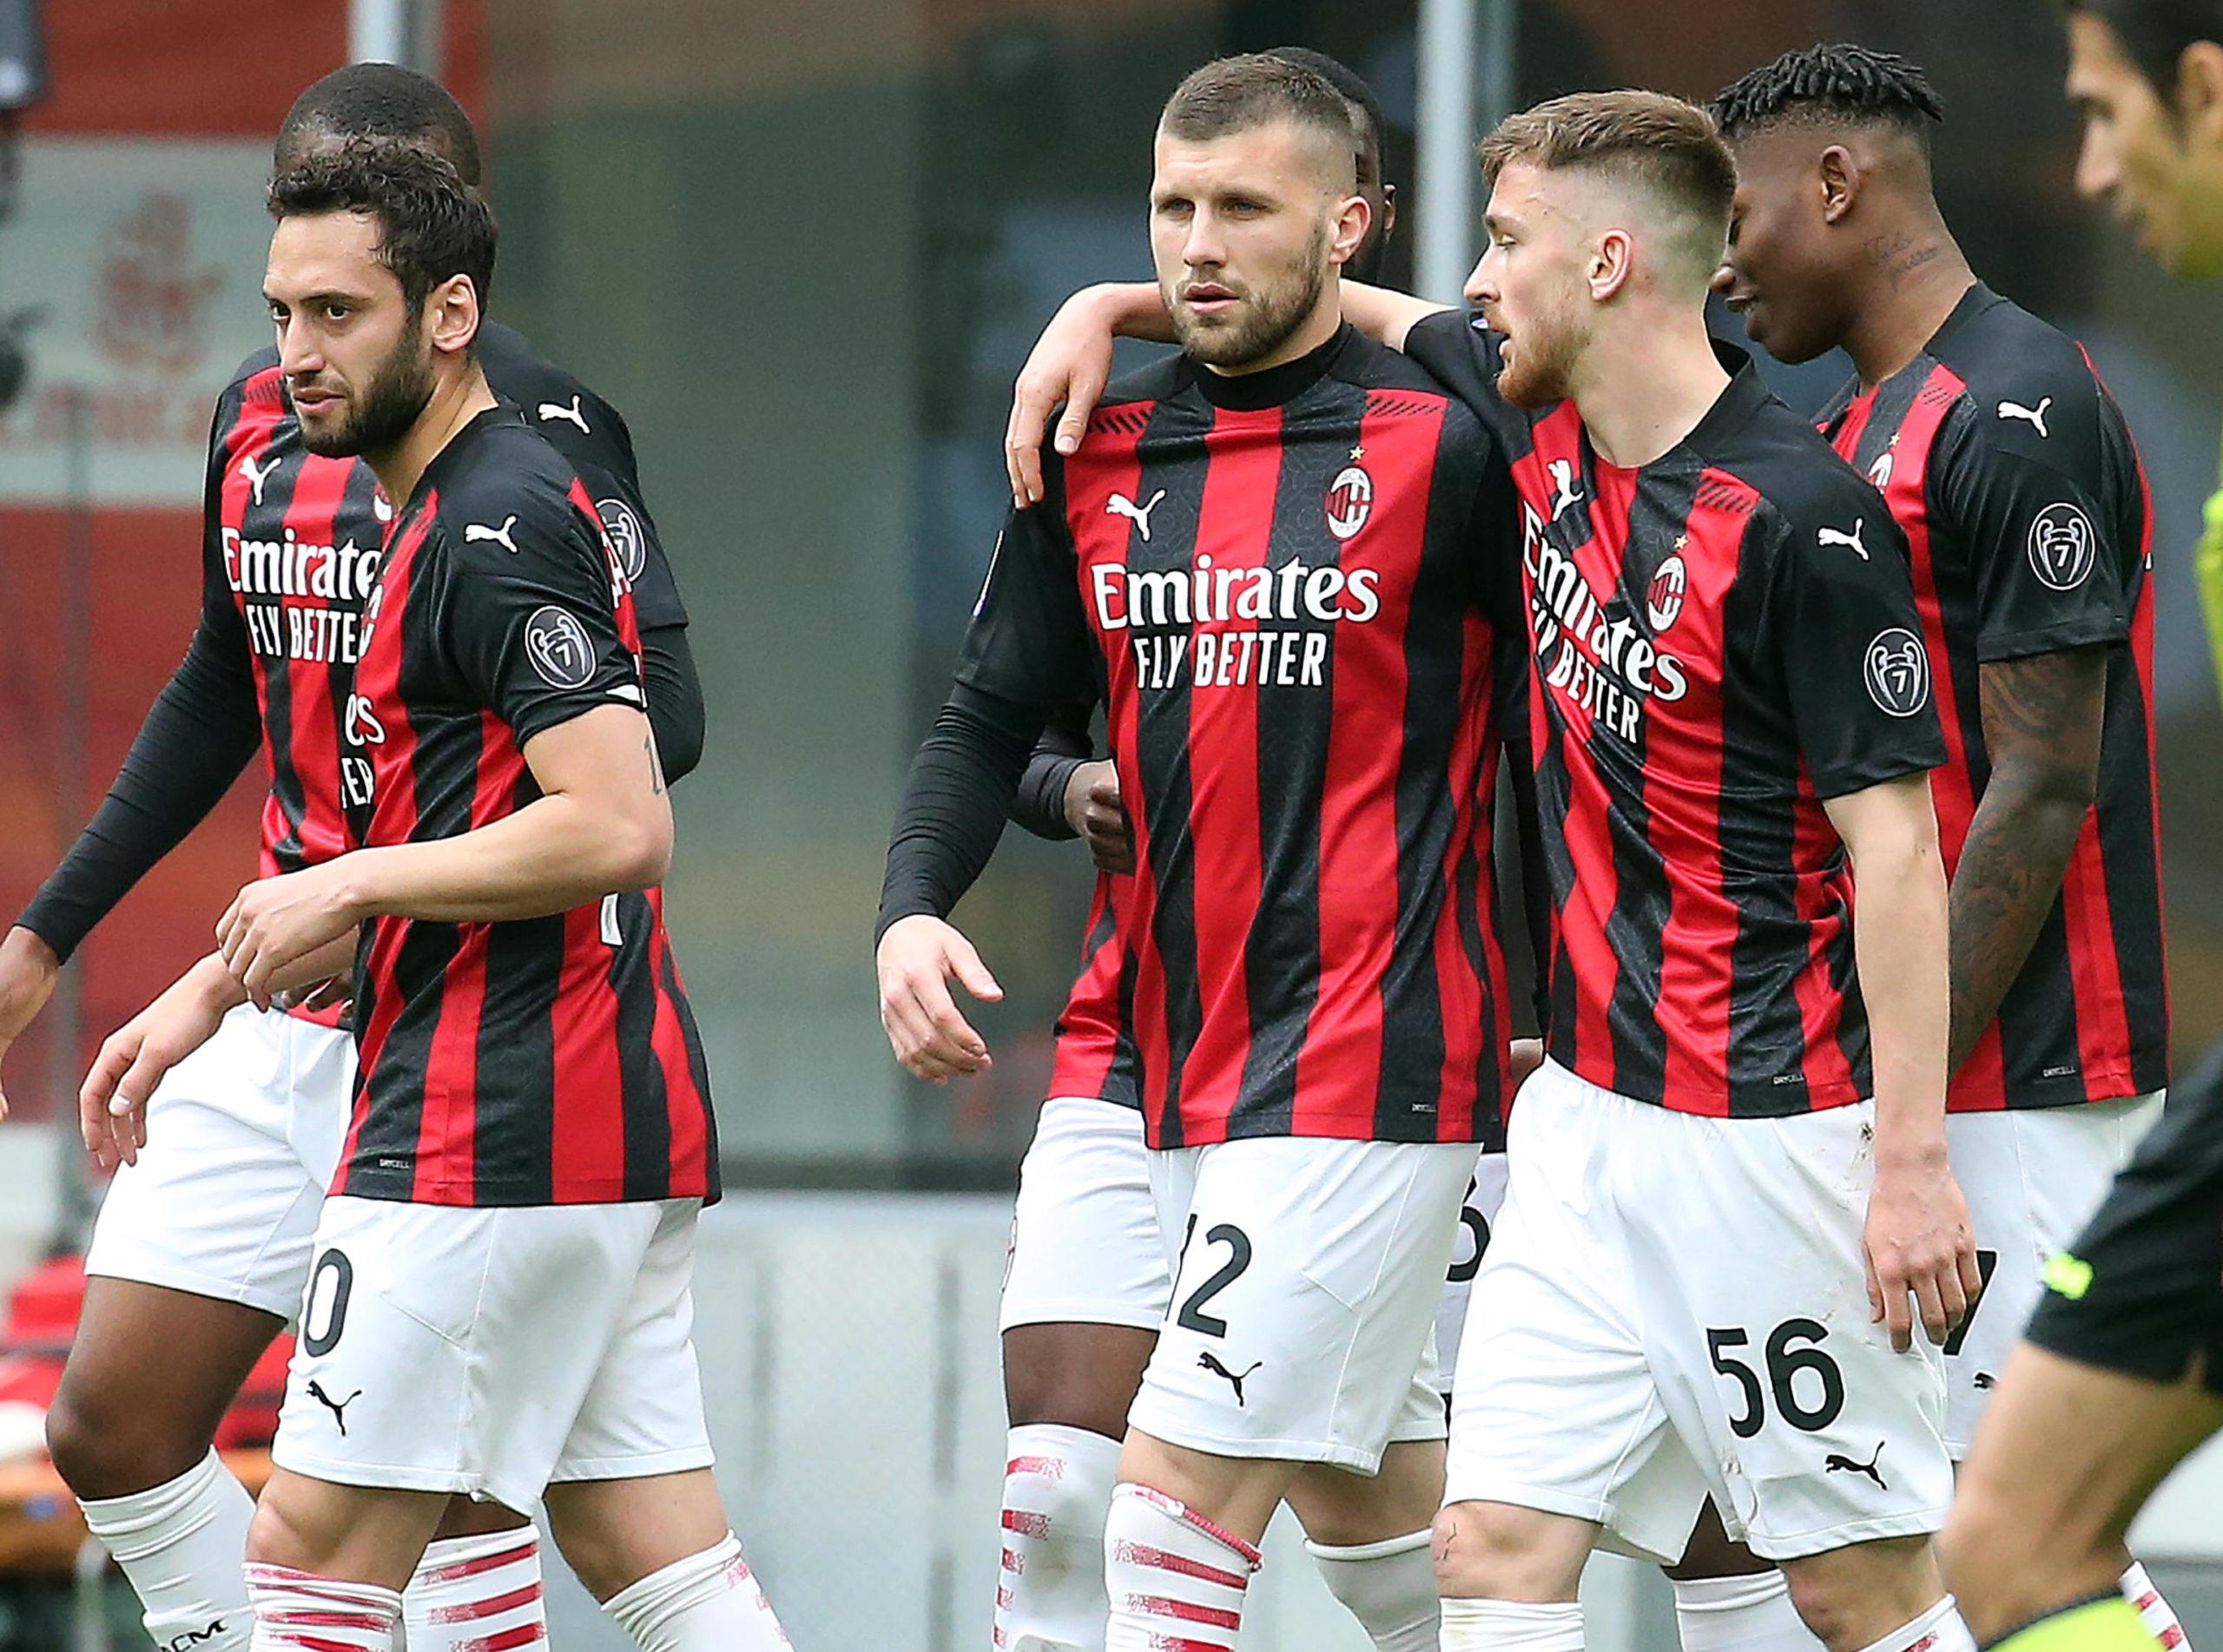 Ante Rebic celebrates a goal with his Milan teammates